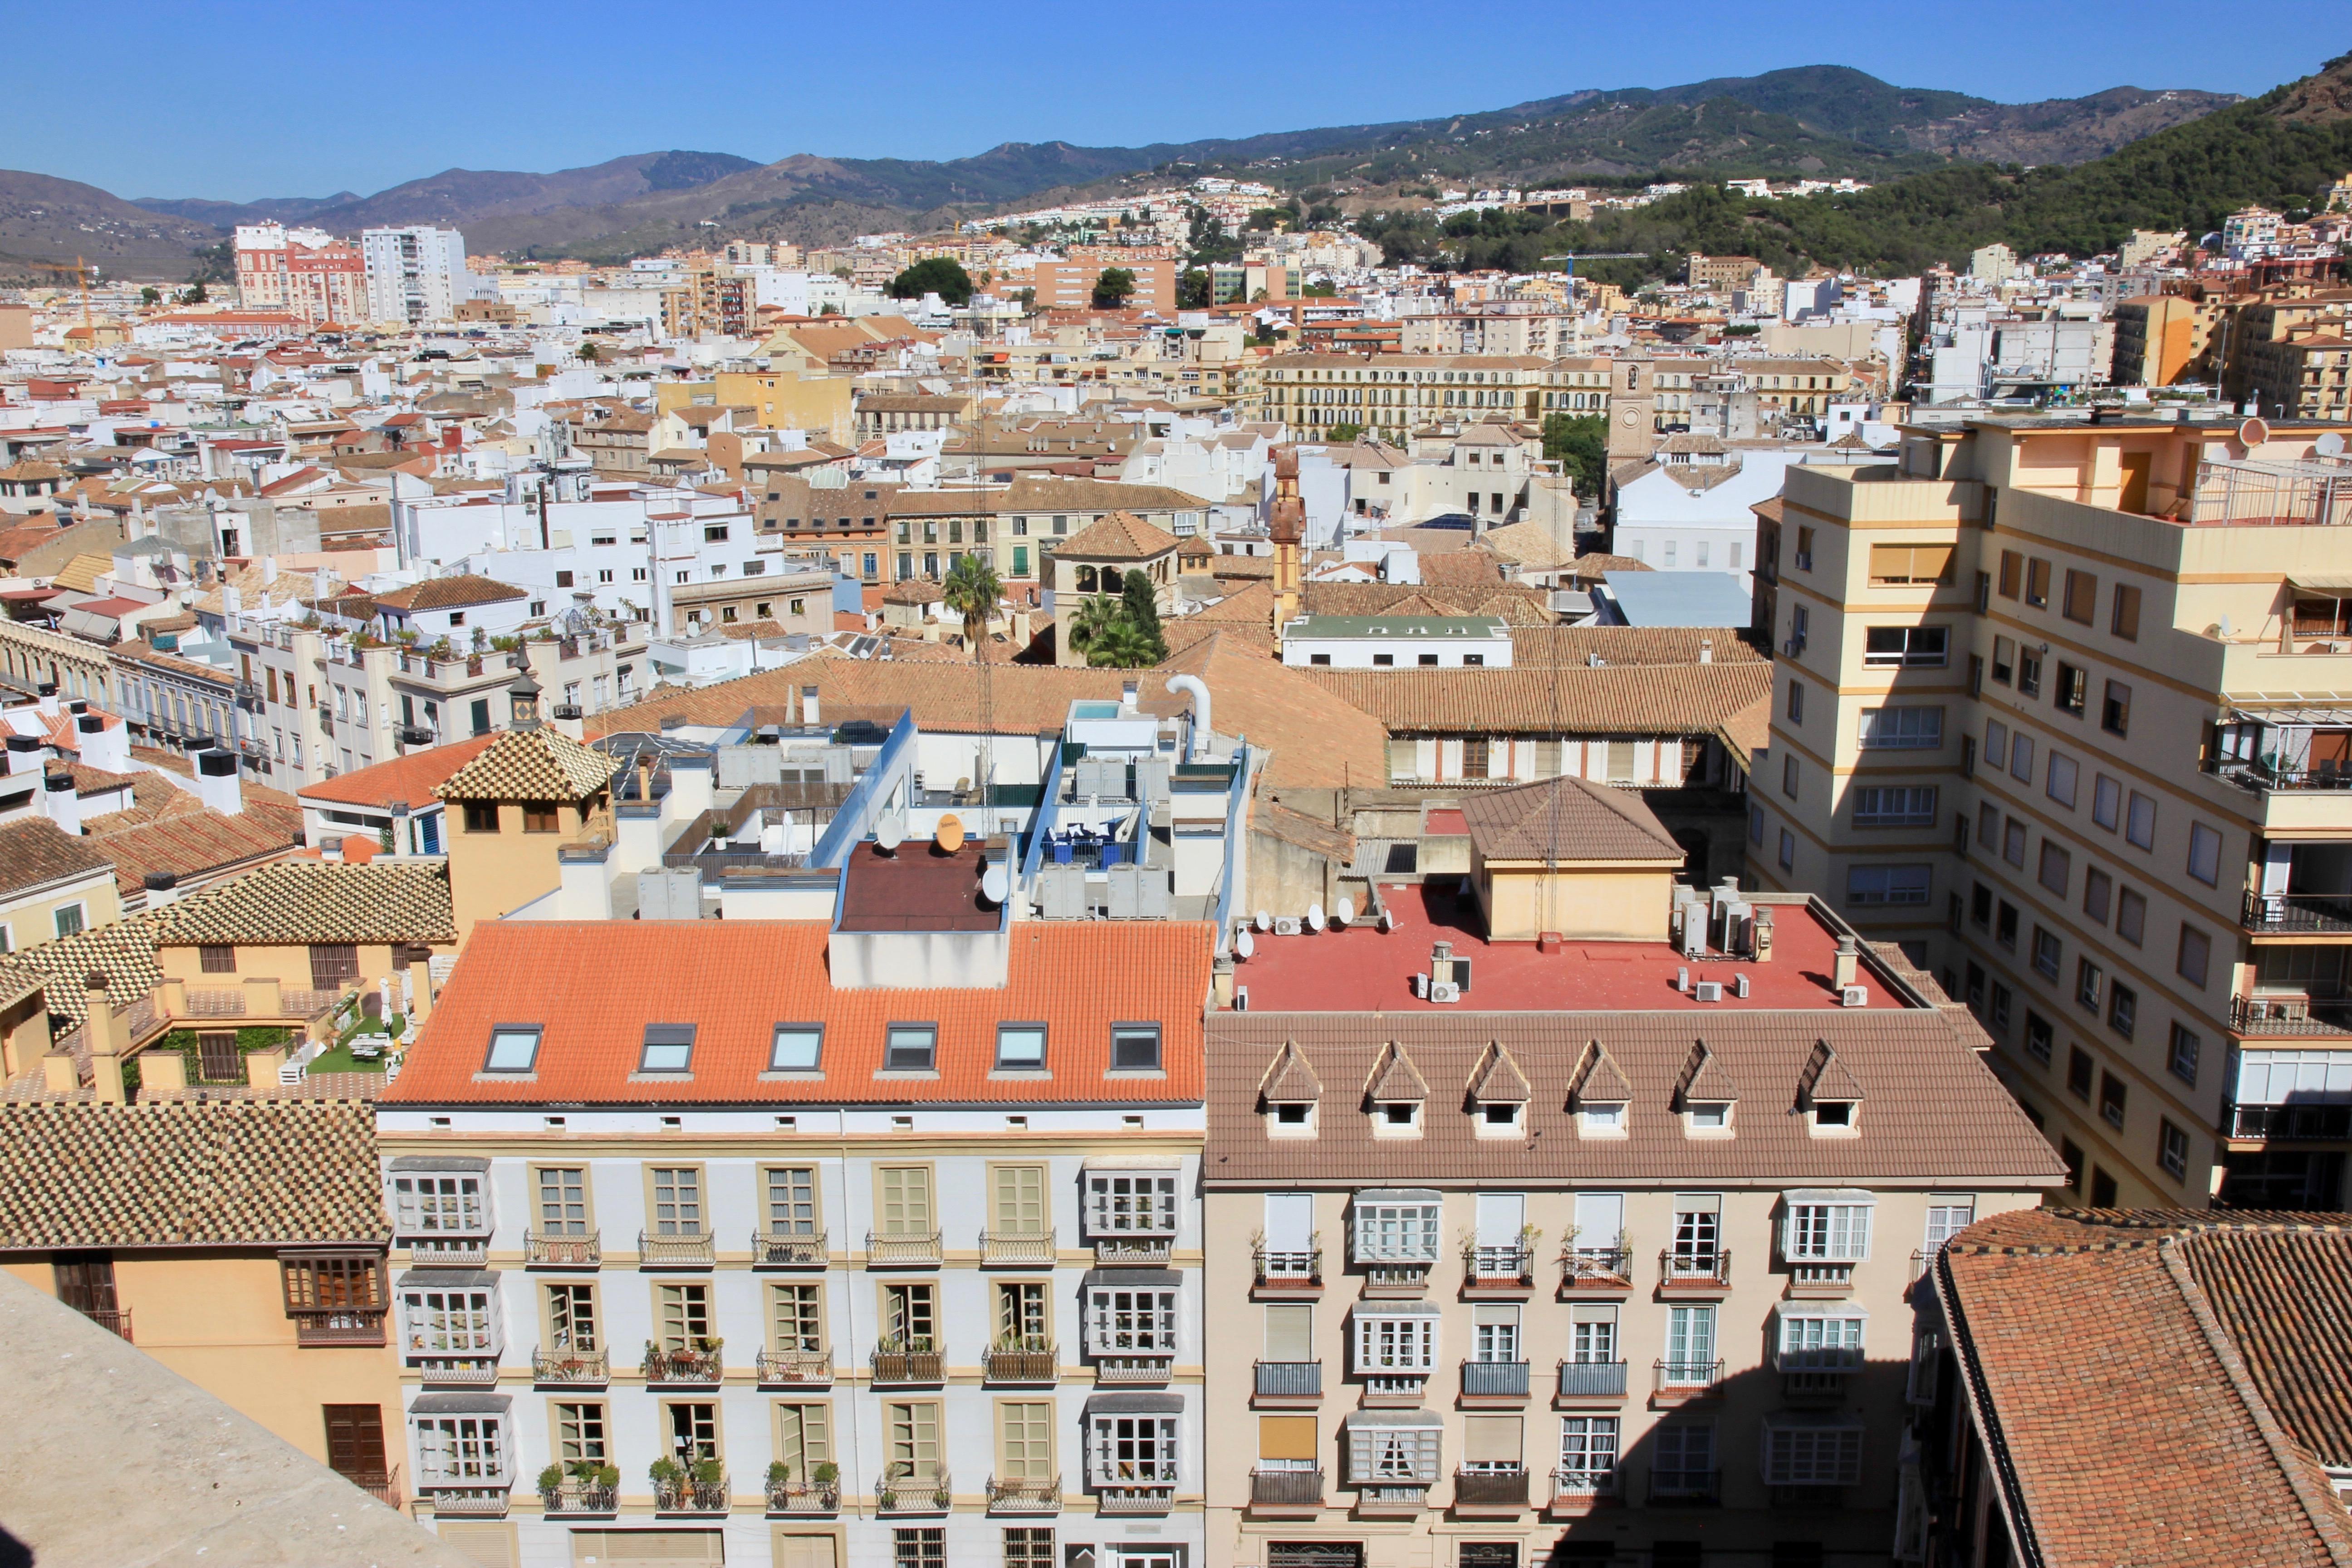 Cubiertas della cattedrale di Málaga